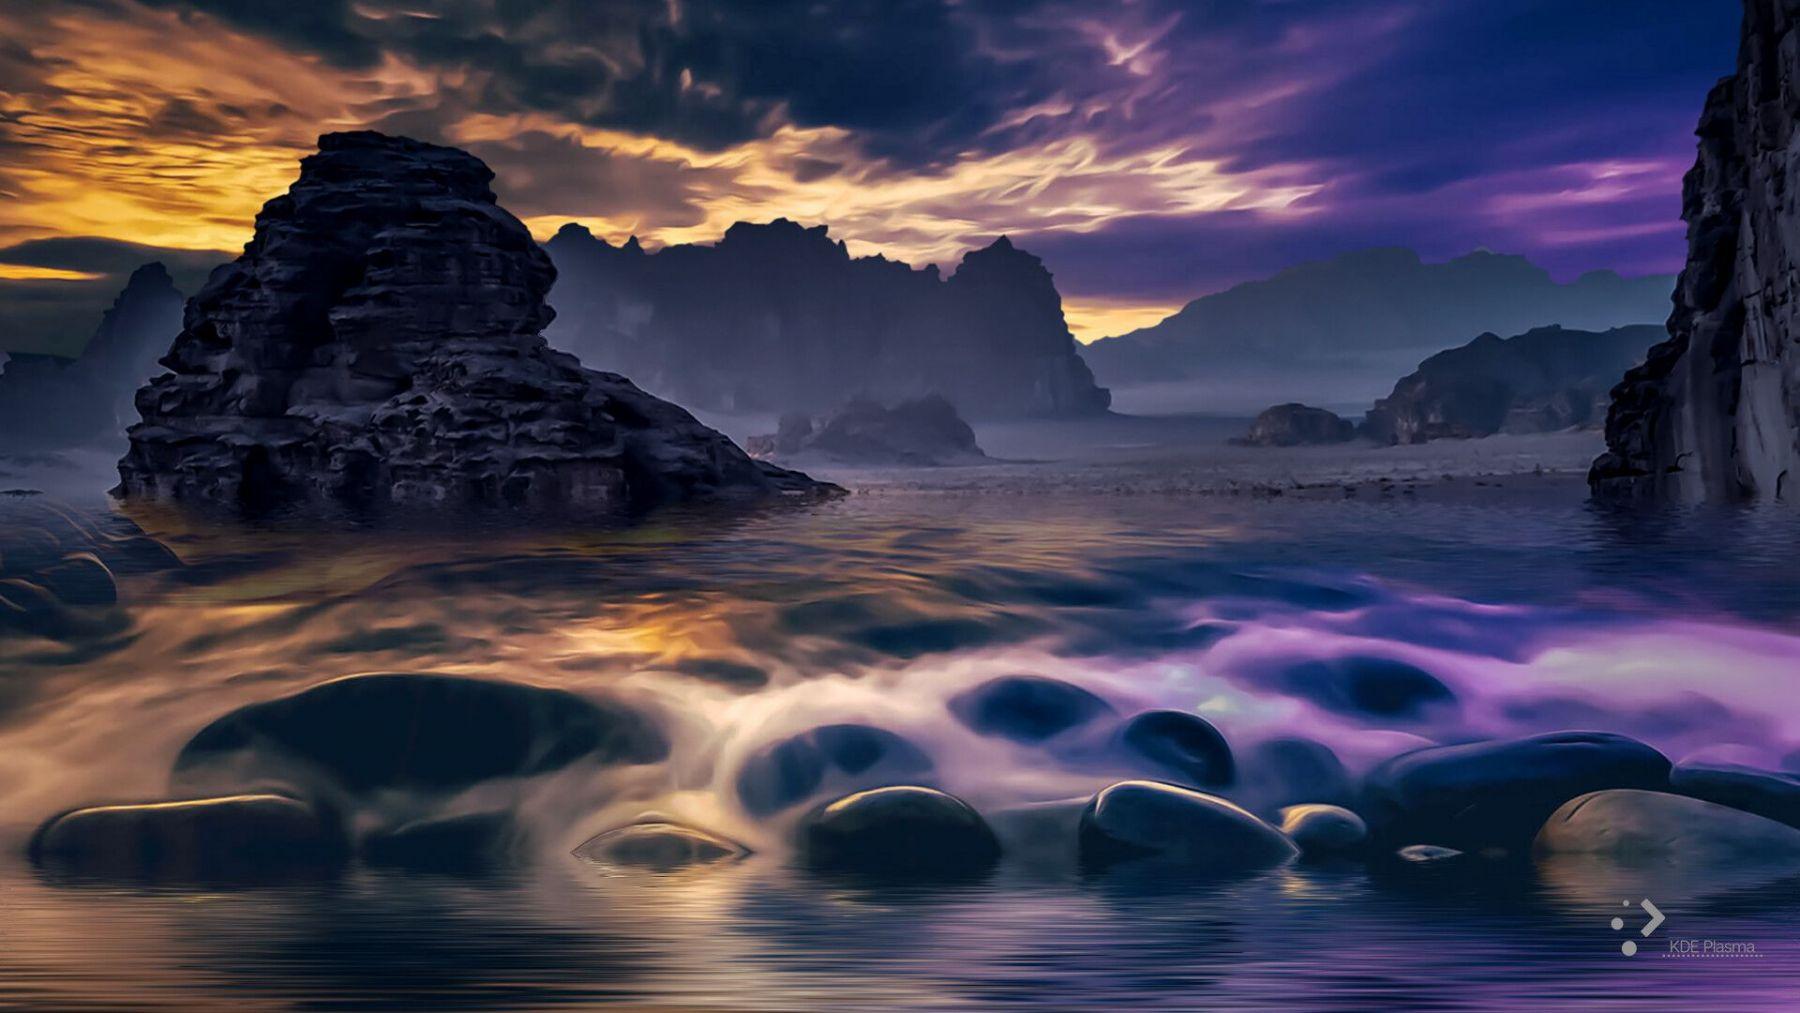 charlie-henson-kde-plasma-scenery-100_202